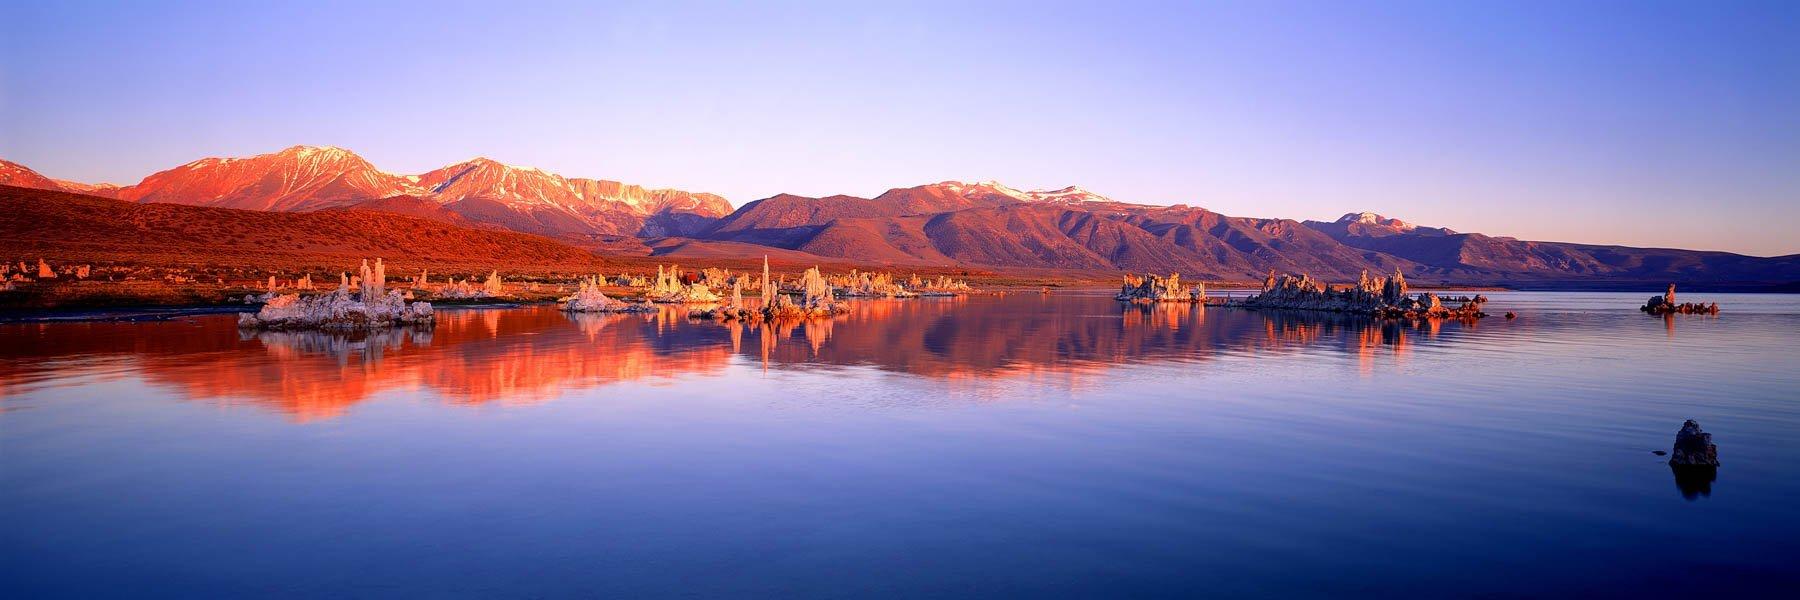 Salt lake, Mono County, California, USA.